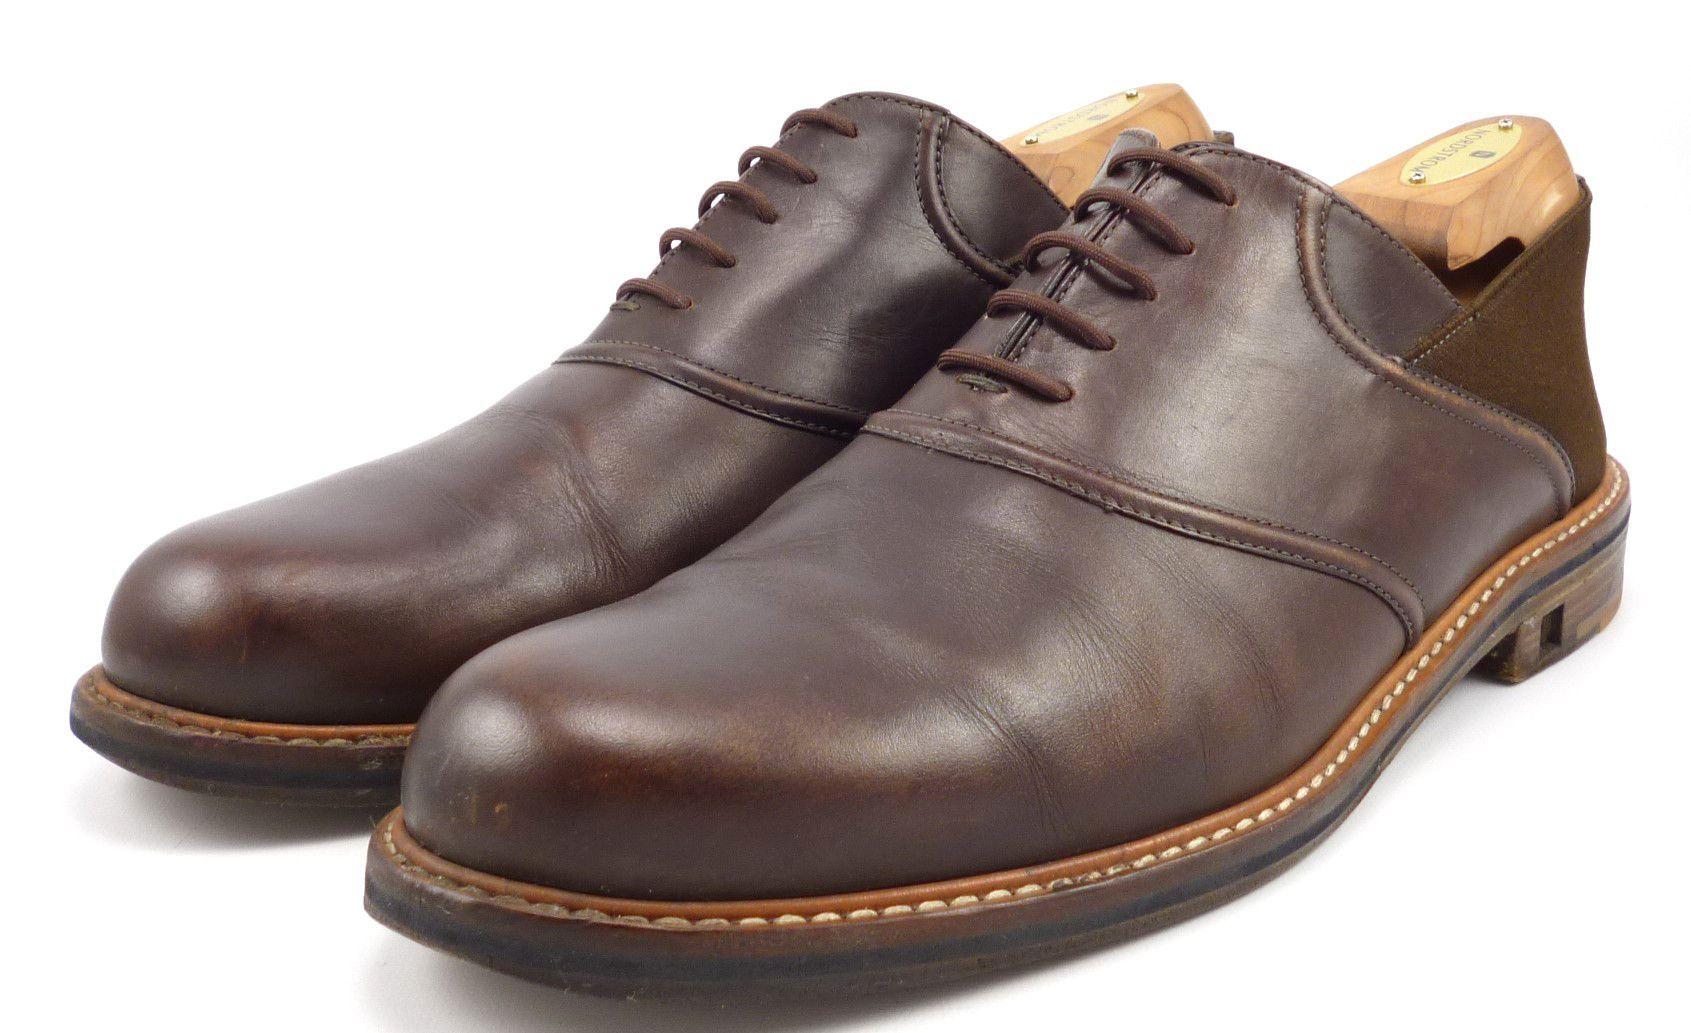 Louis vuitton mens shoes 10 11 us leather oxford brown